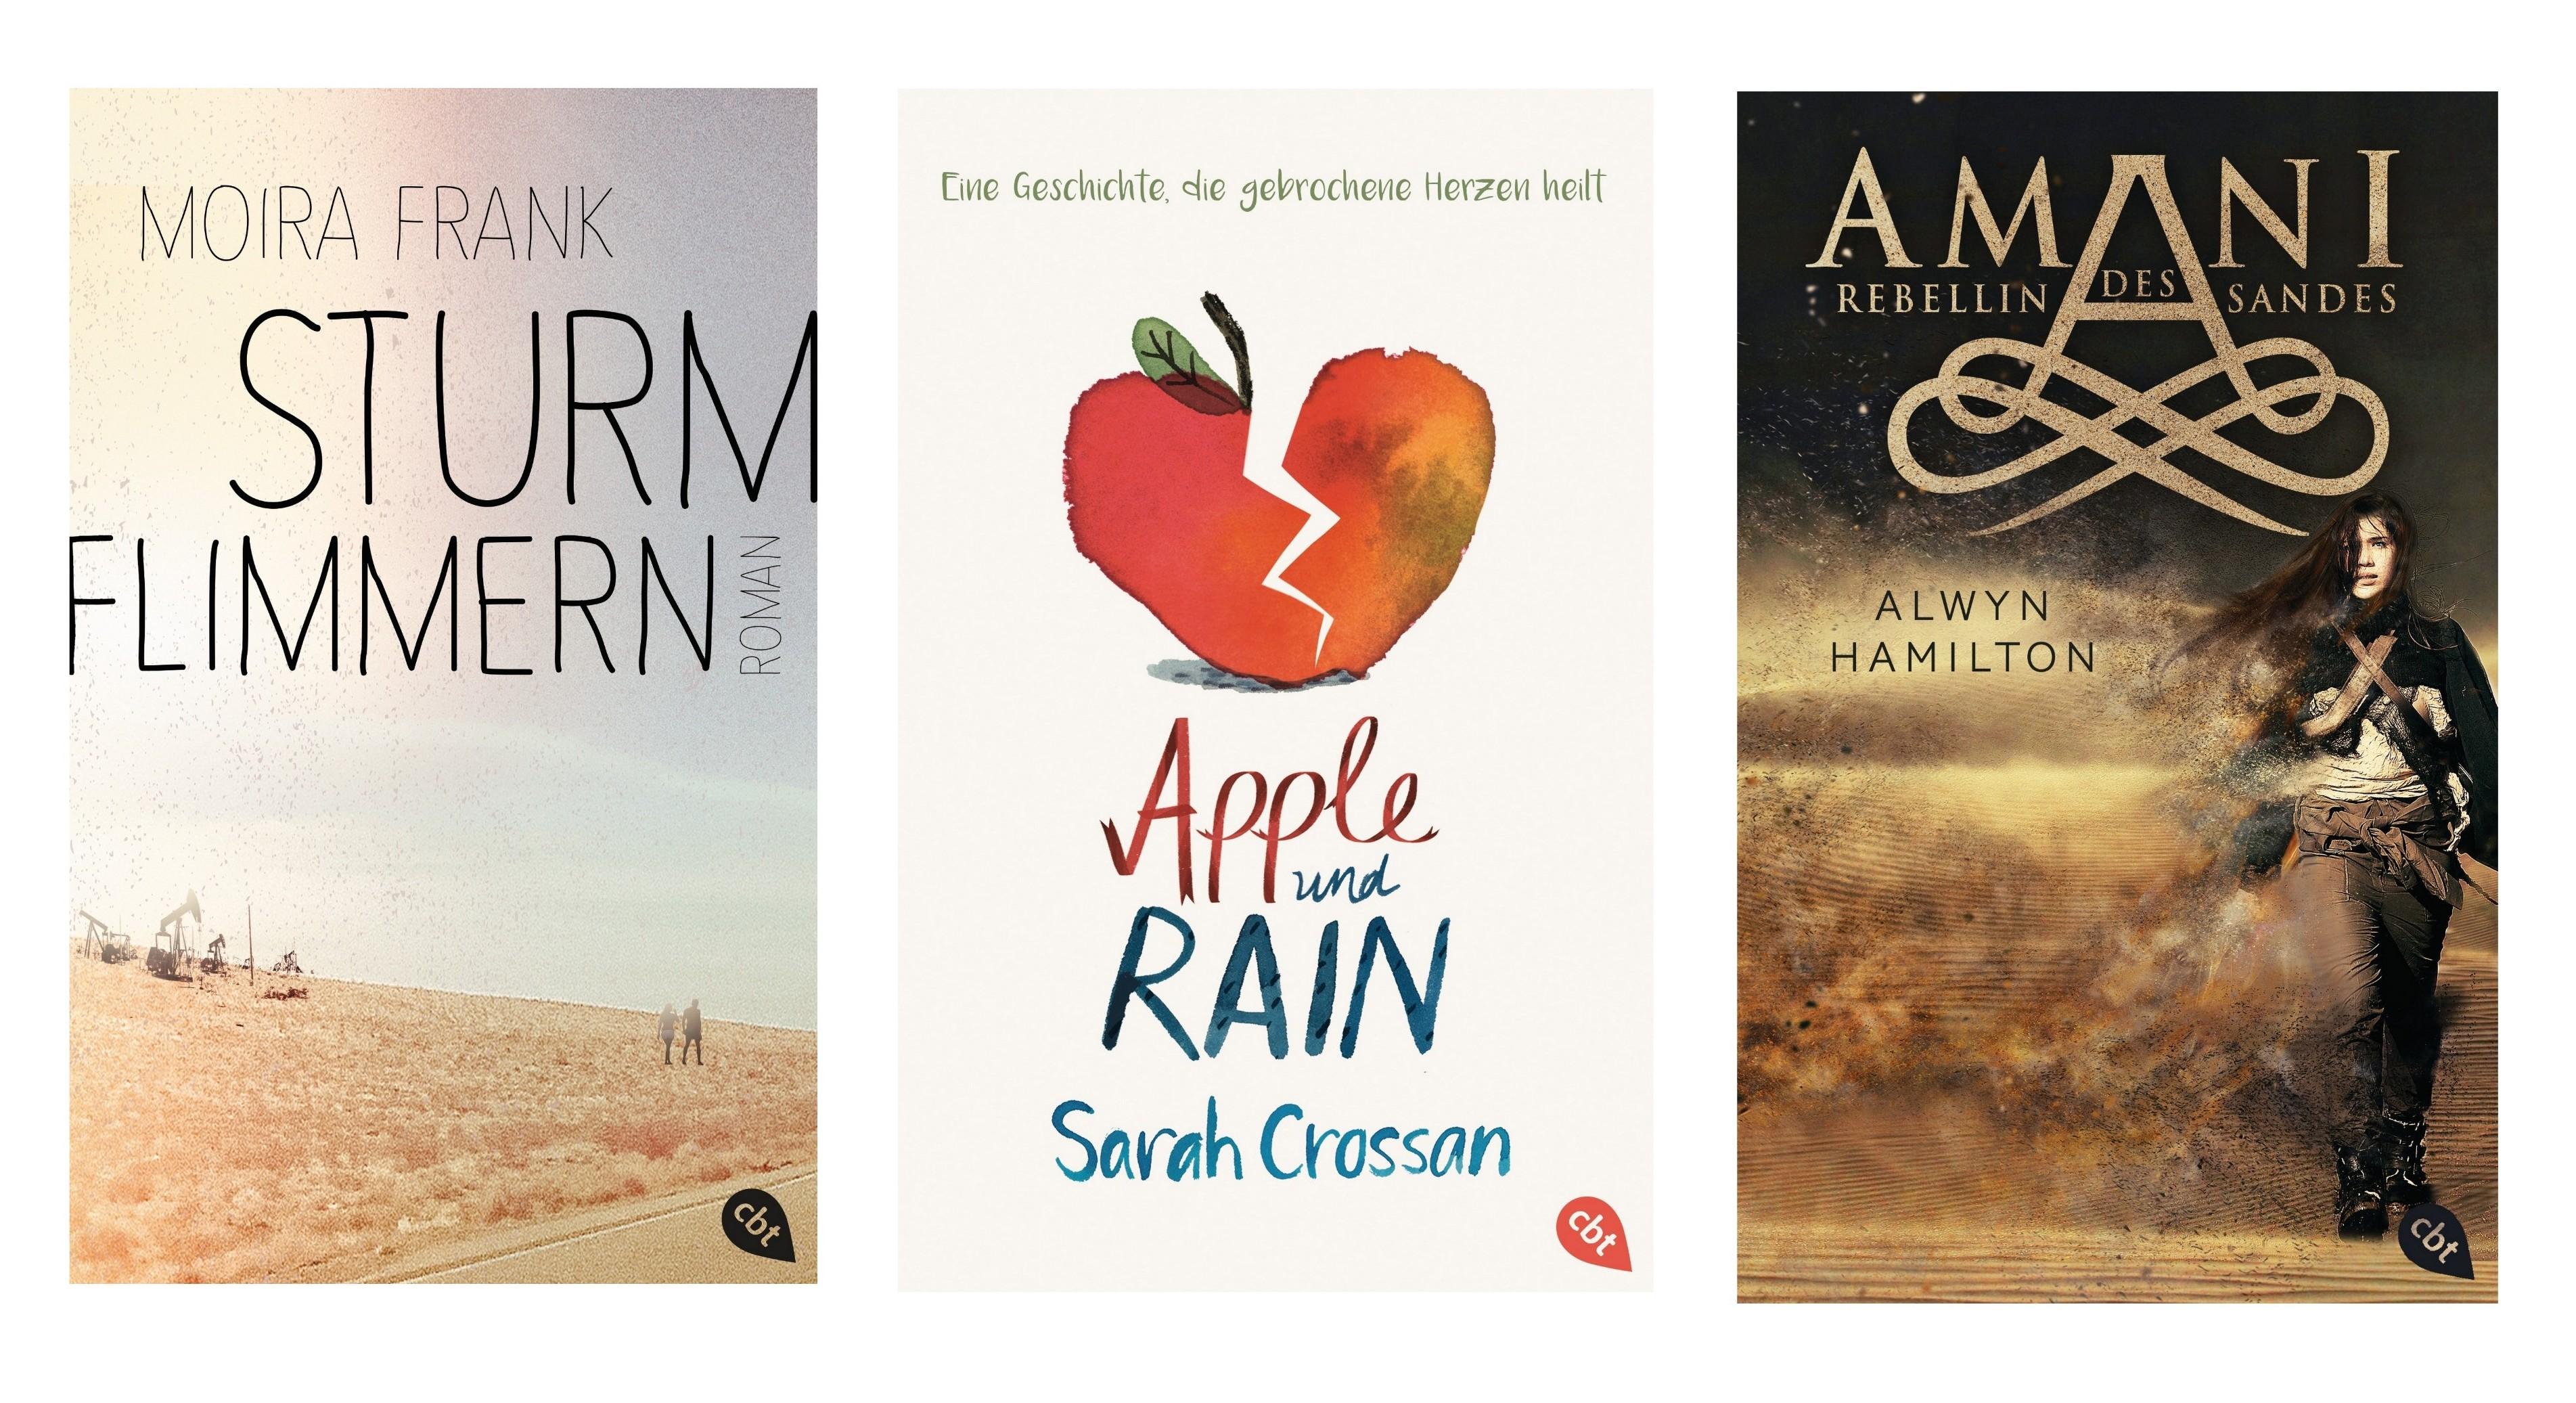 Herbst-/Winterprogramm 2016 der Random House Gruppe - Wunschbücher